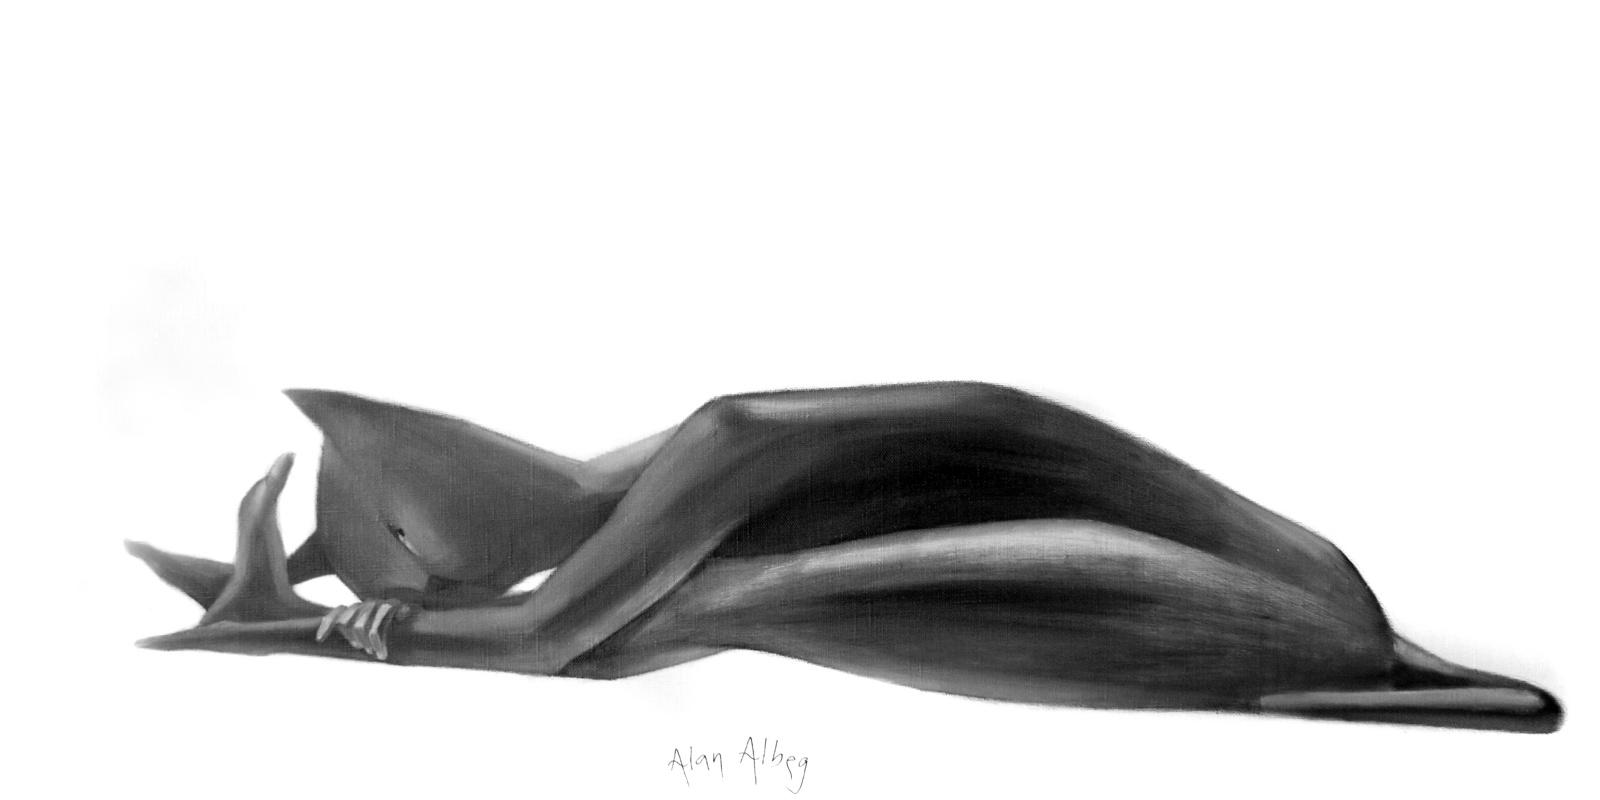 Alan Albegov. Hold your breath